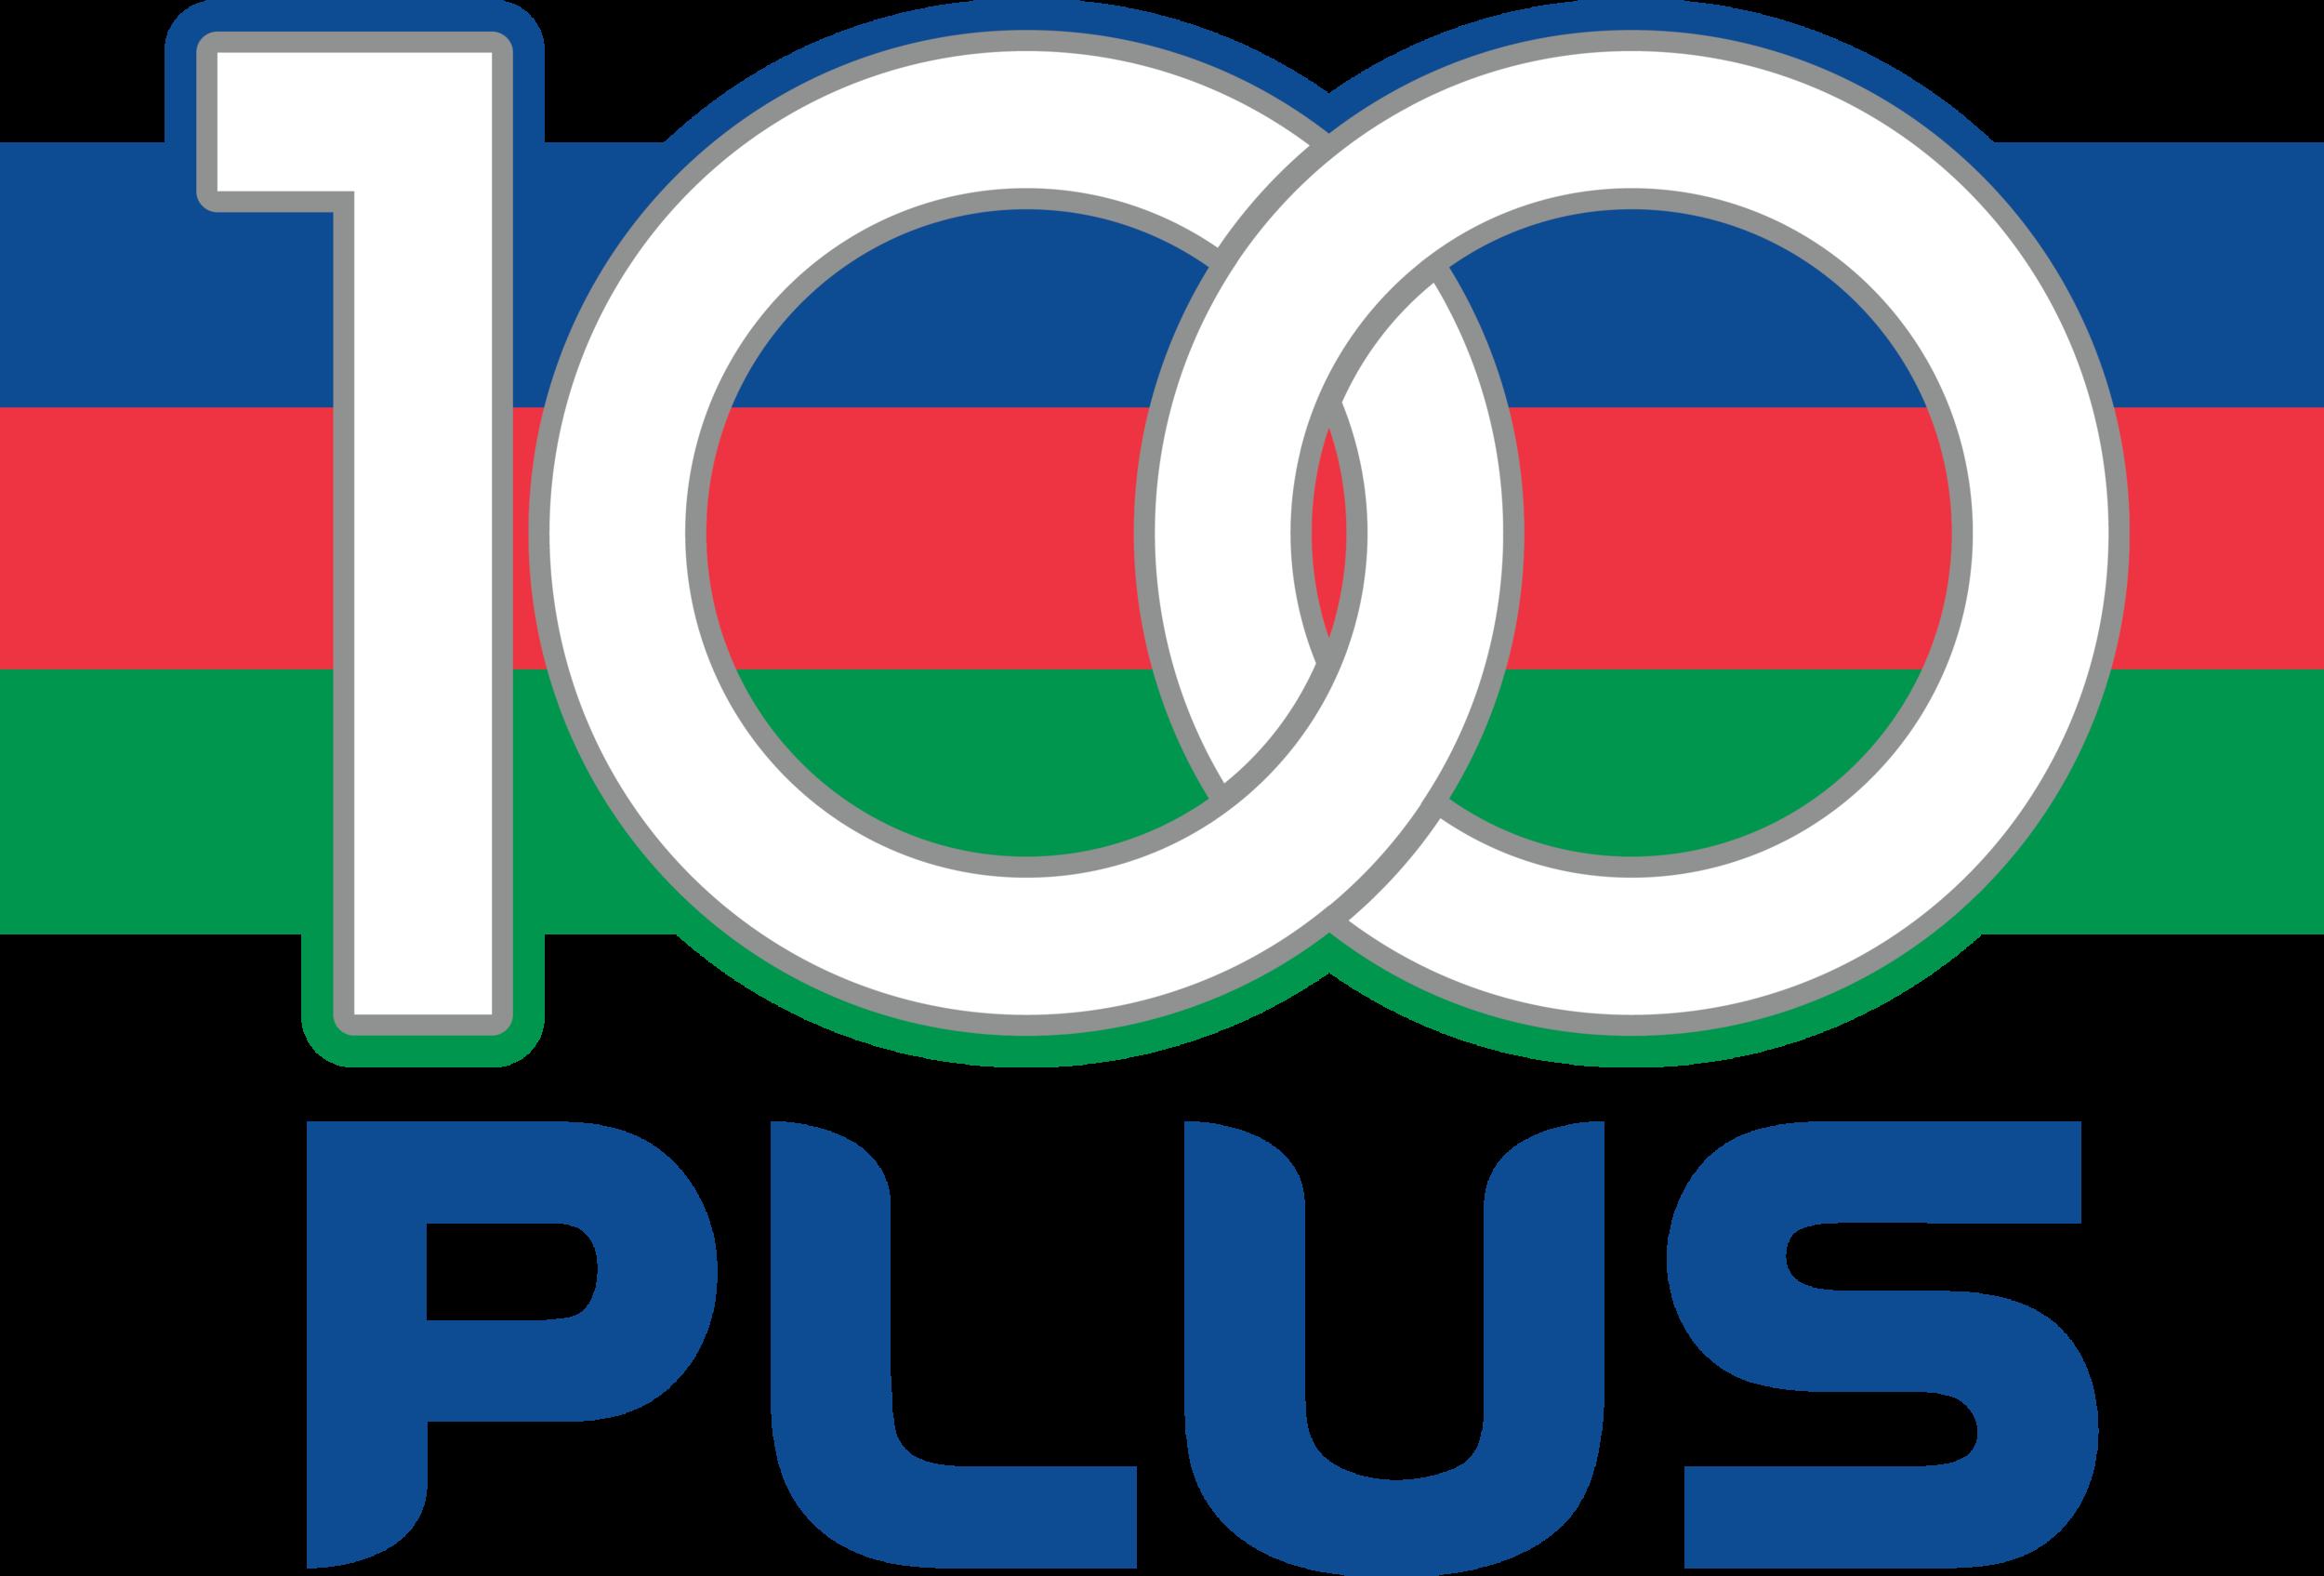 100 Plus.png